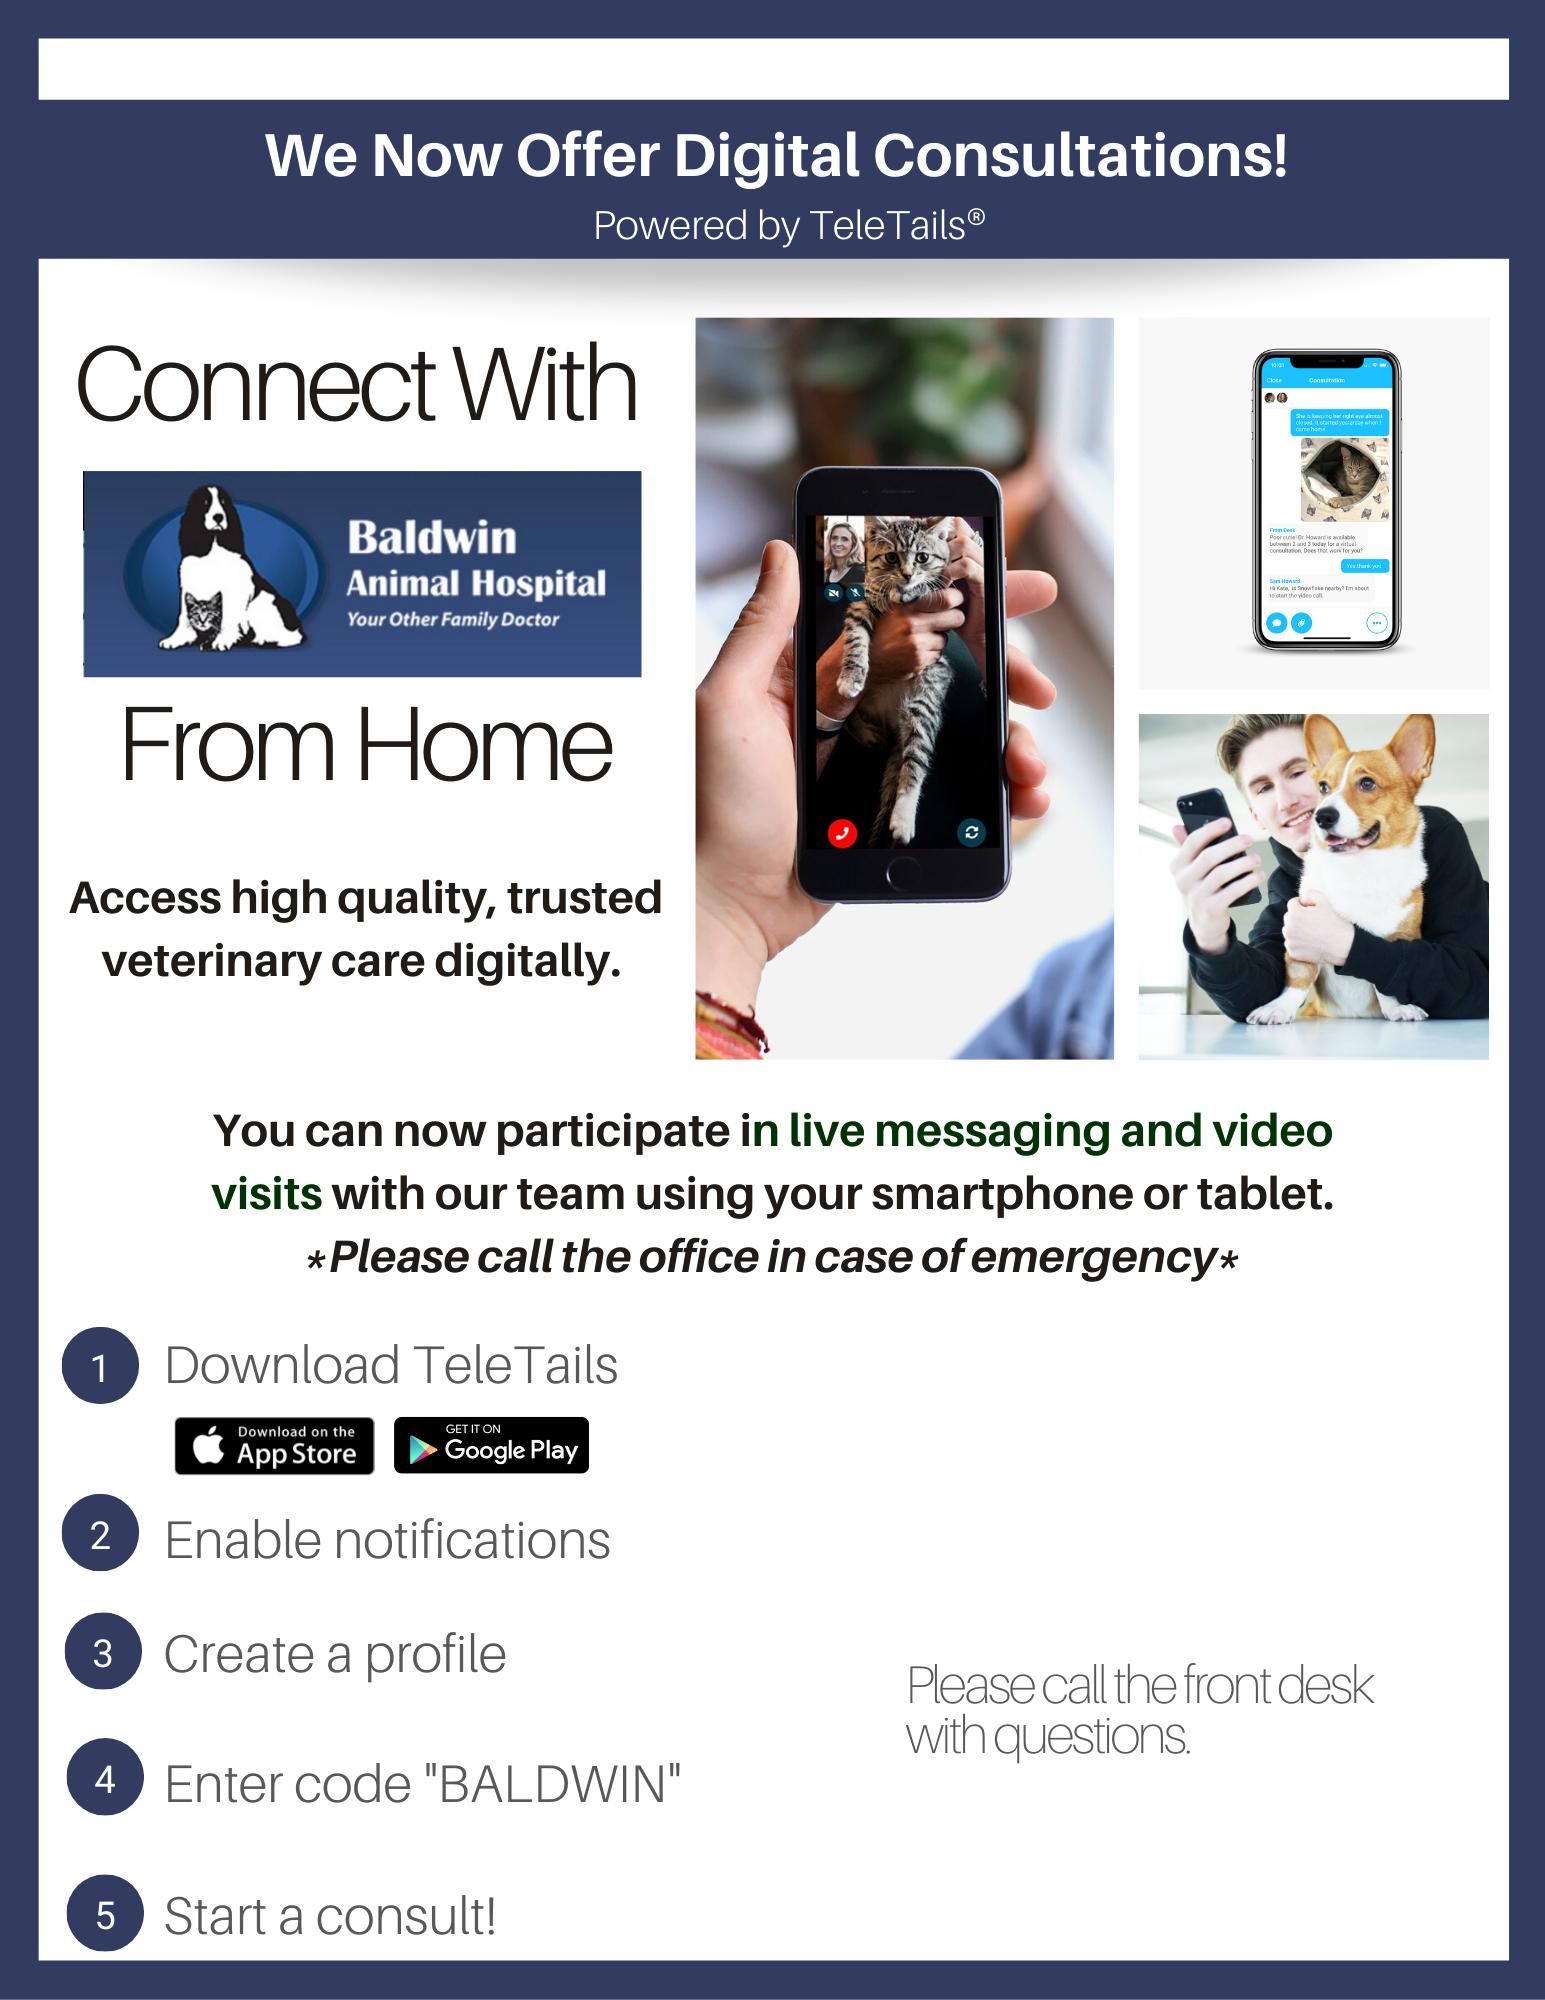 TeleTails Virtual Veterinary Care